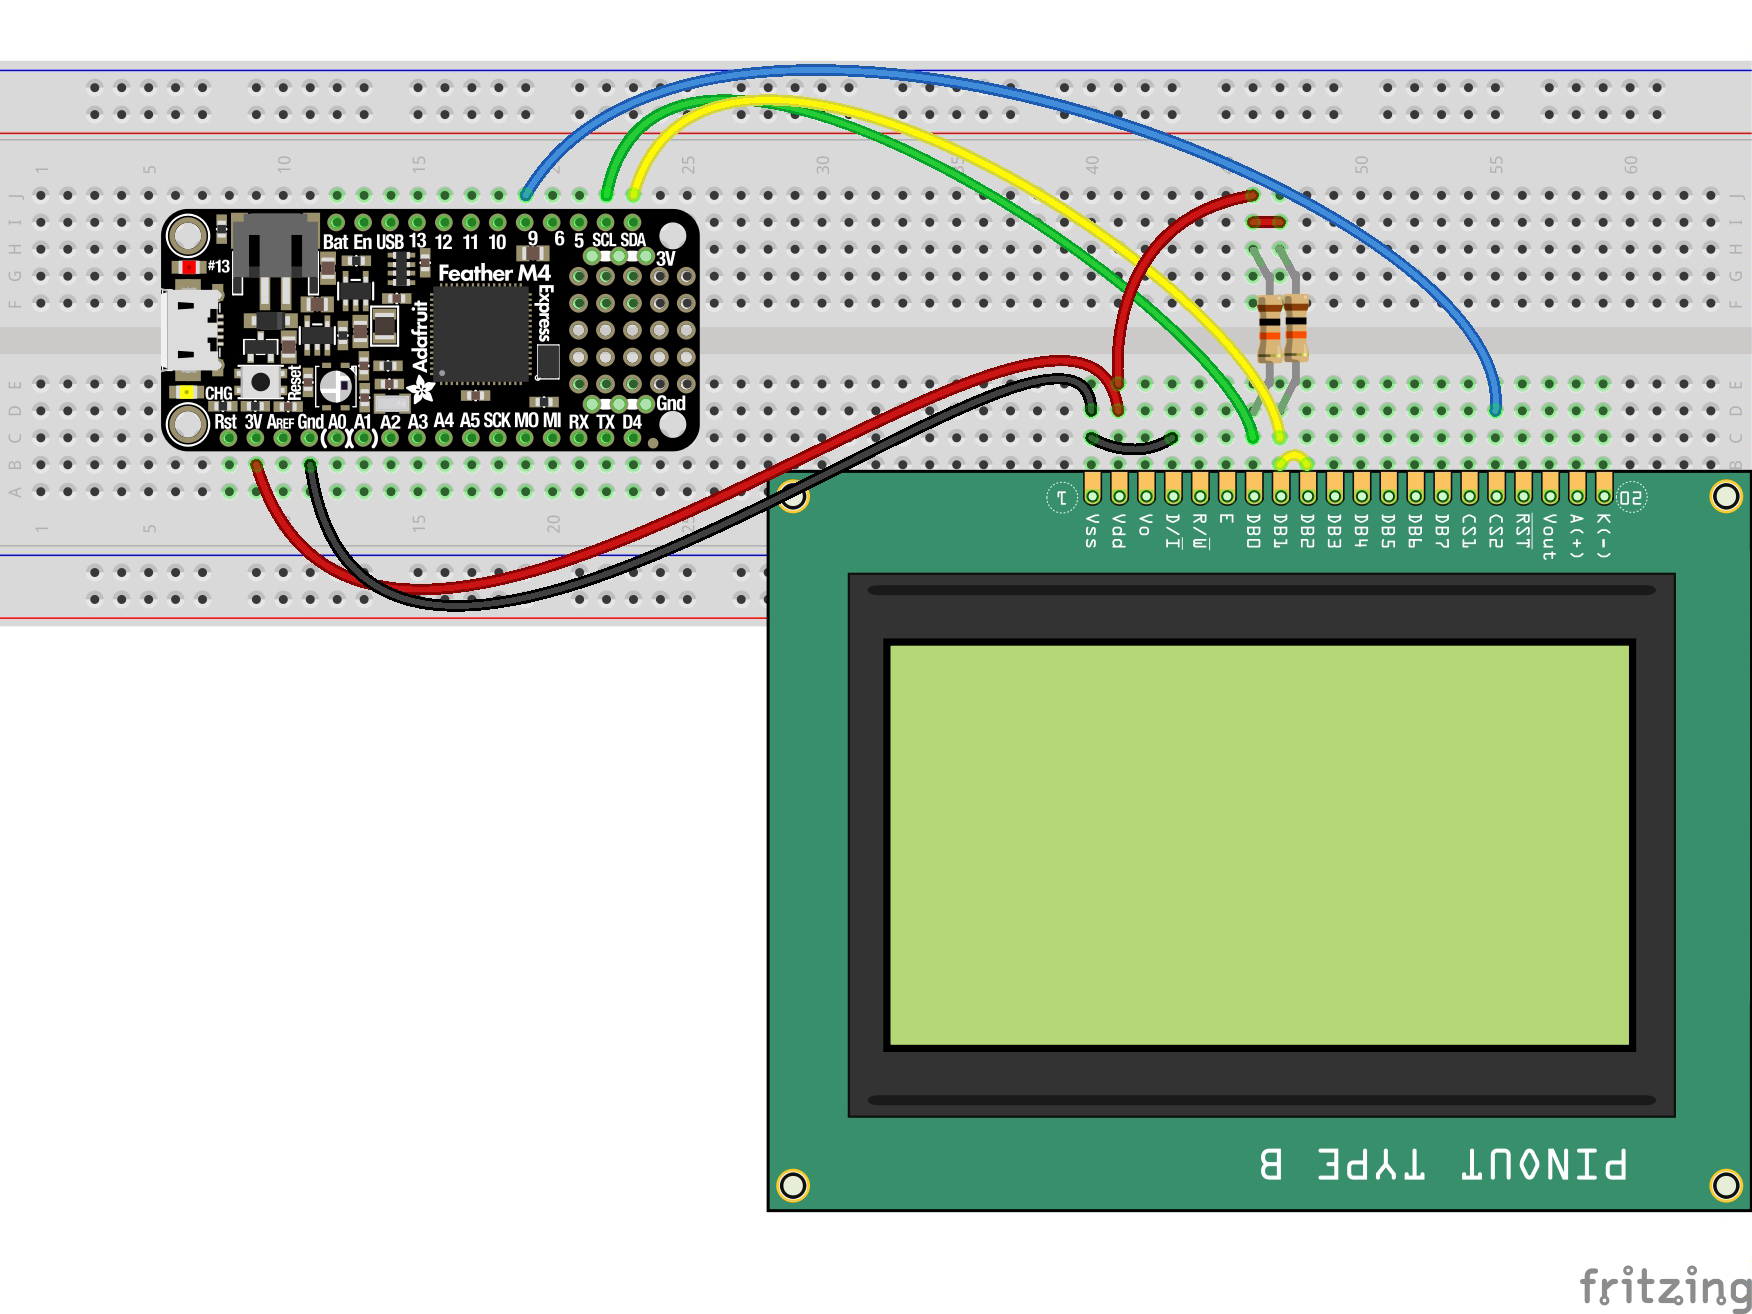 adafruit_products_circuitpython_i2c_wiring_bb.jpg